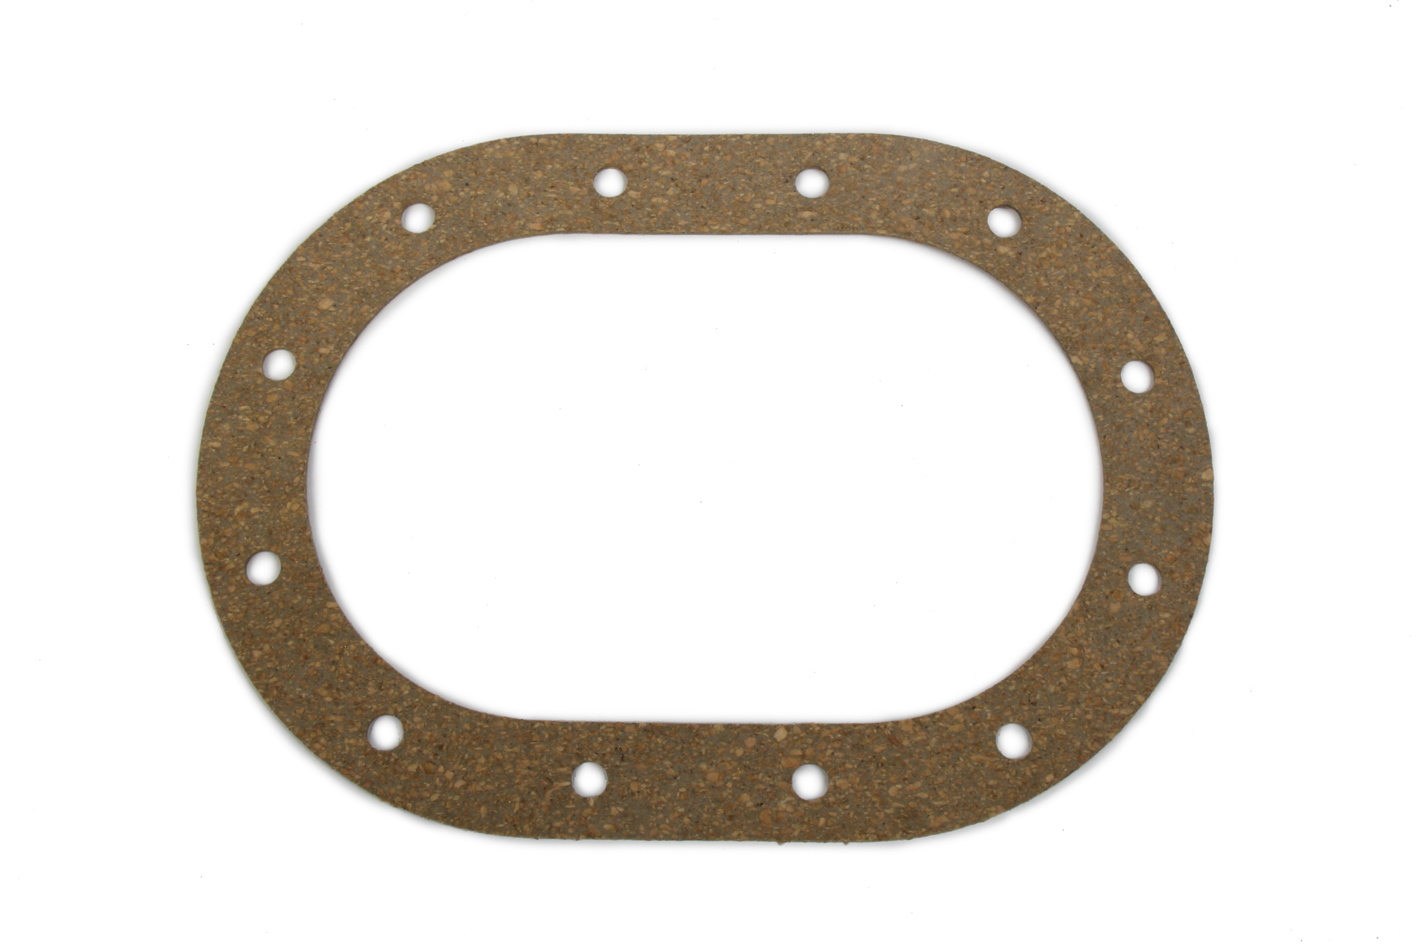 Top Plate Gasket 4x6 Cork 12 Hole